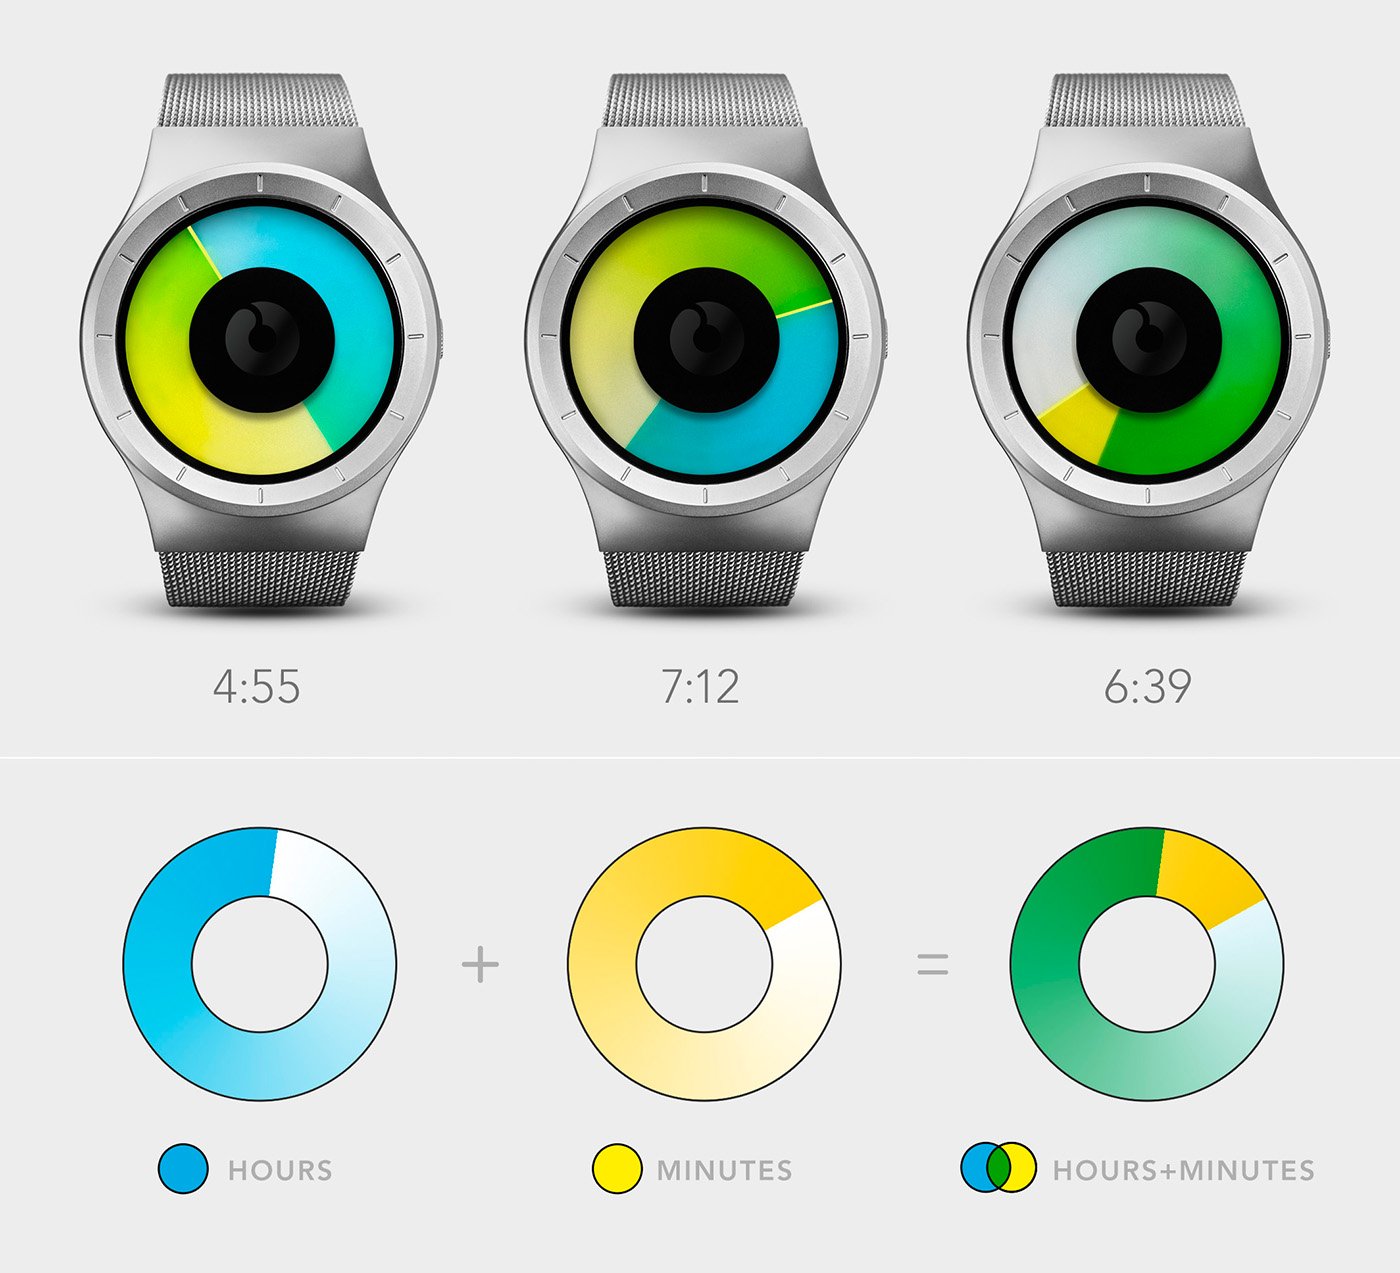 ZIIIRO Uhren online kaufen auf schmuckladen.de